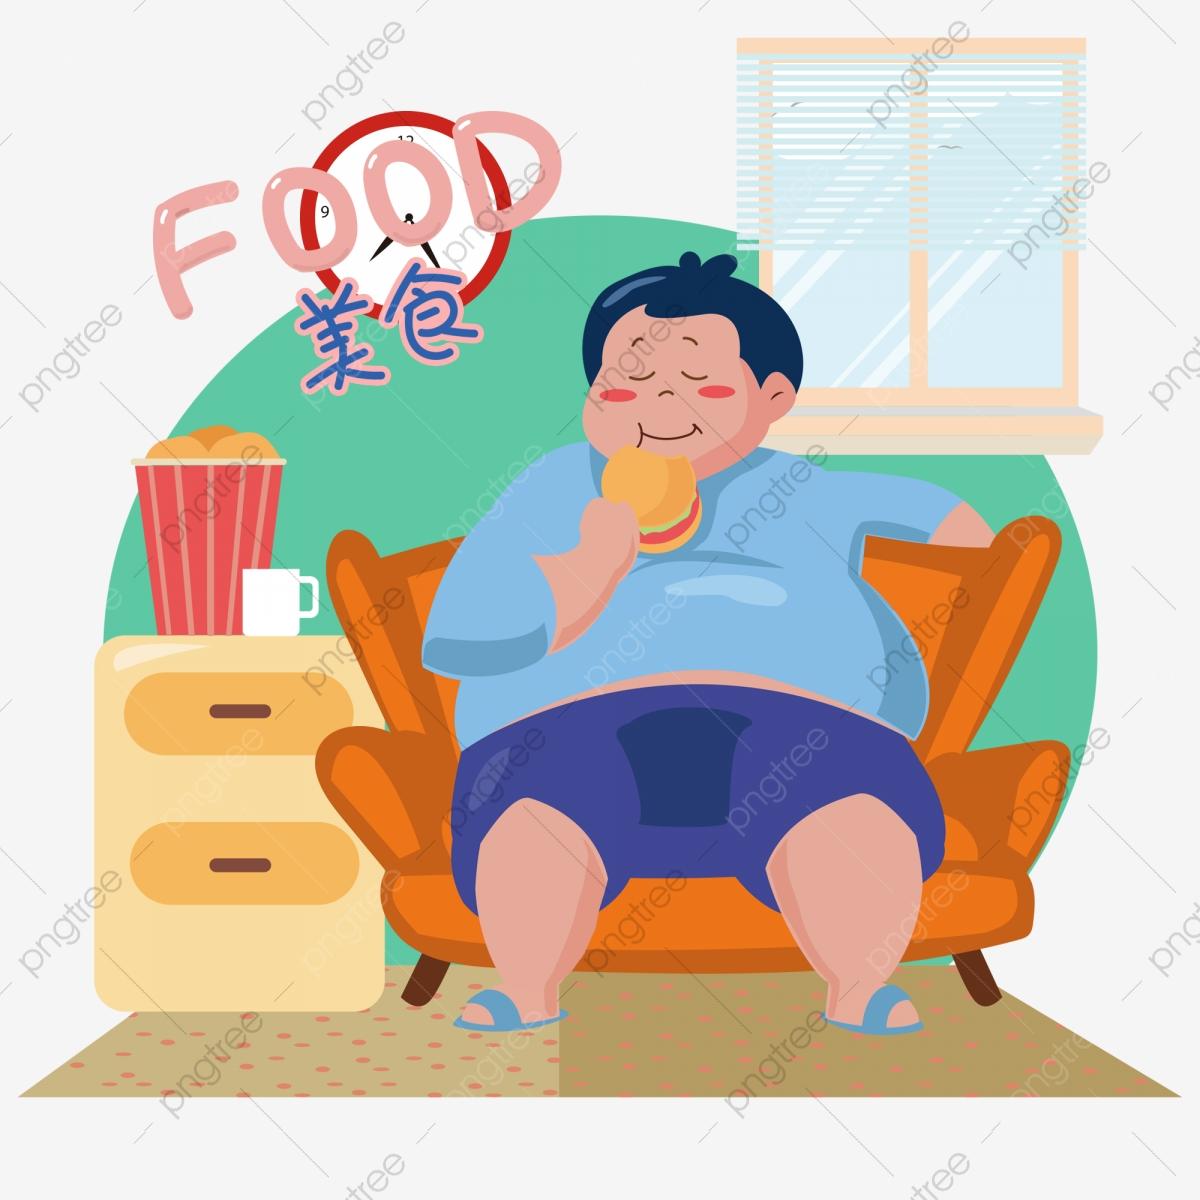 Diabetes clipart fat. A man sitting on